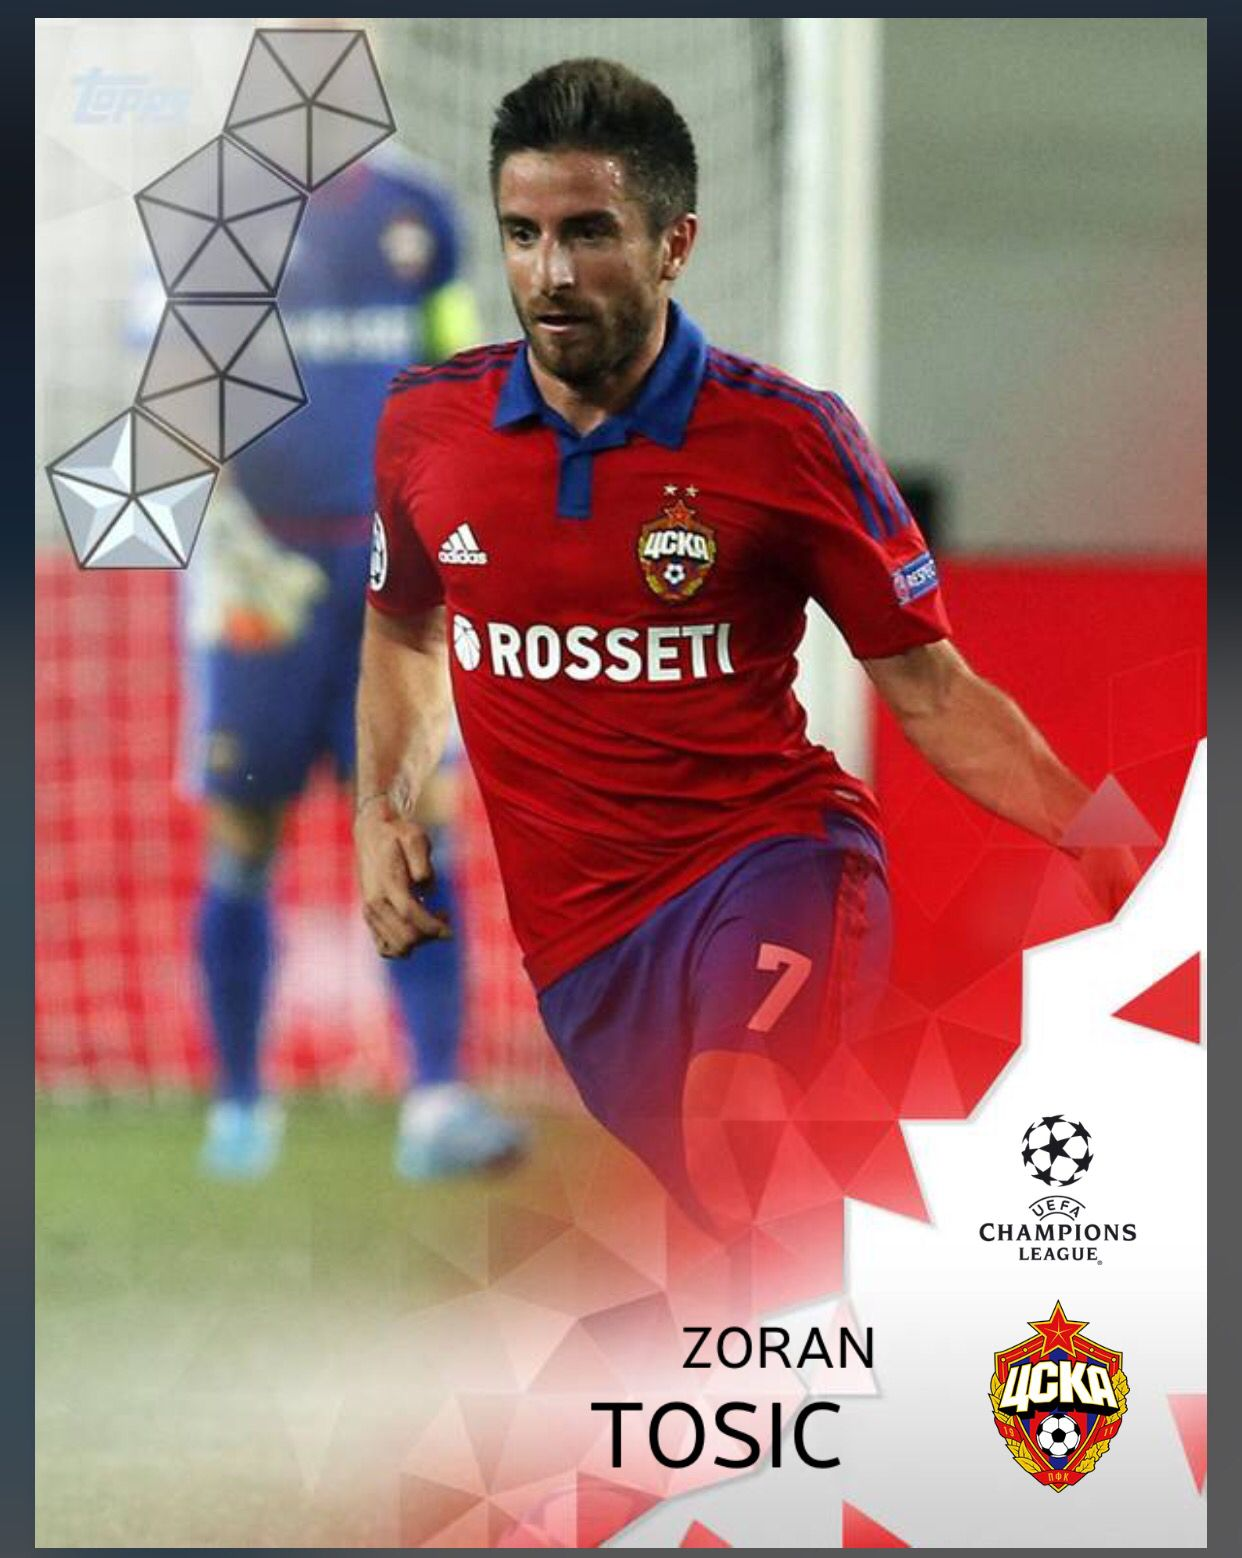 Zoran Tosic CSKA Moscow (UEFA Champions League) Silver